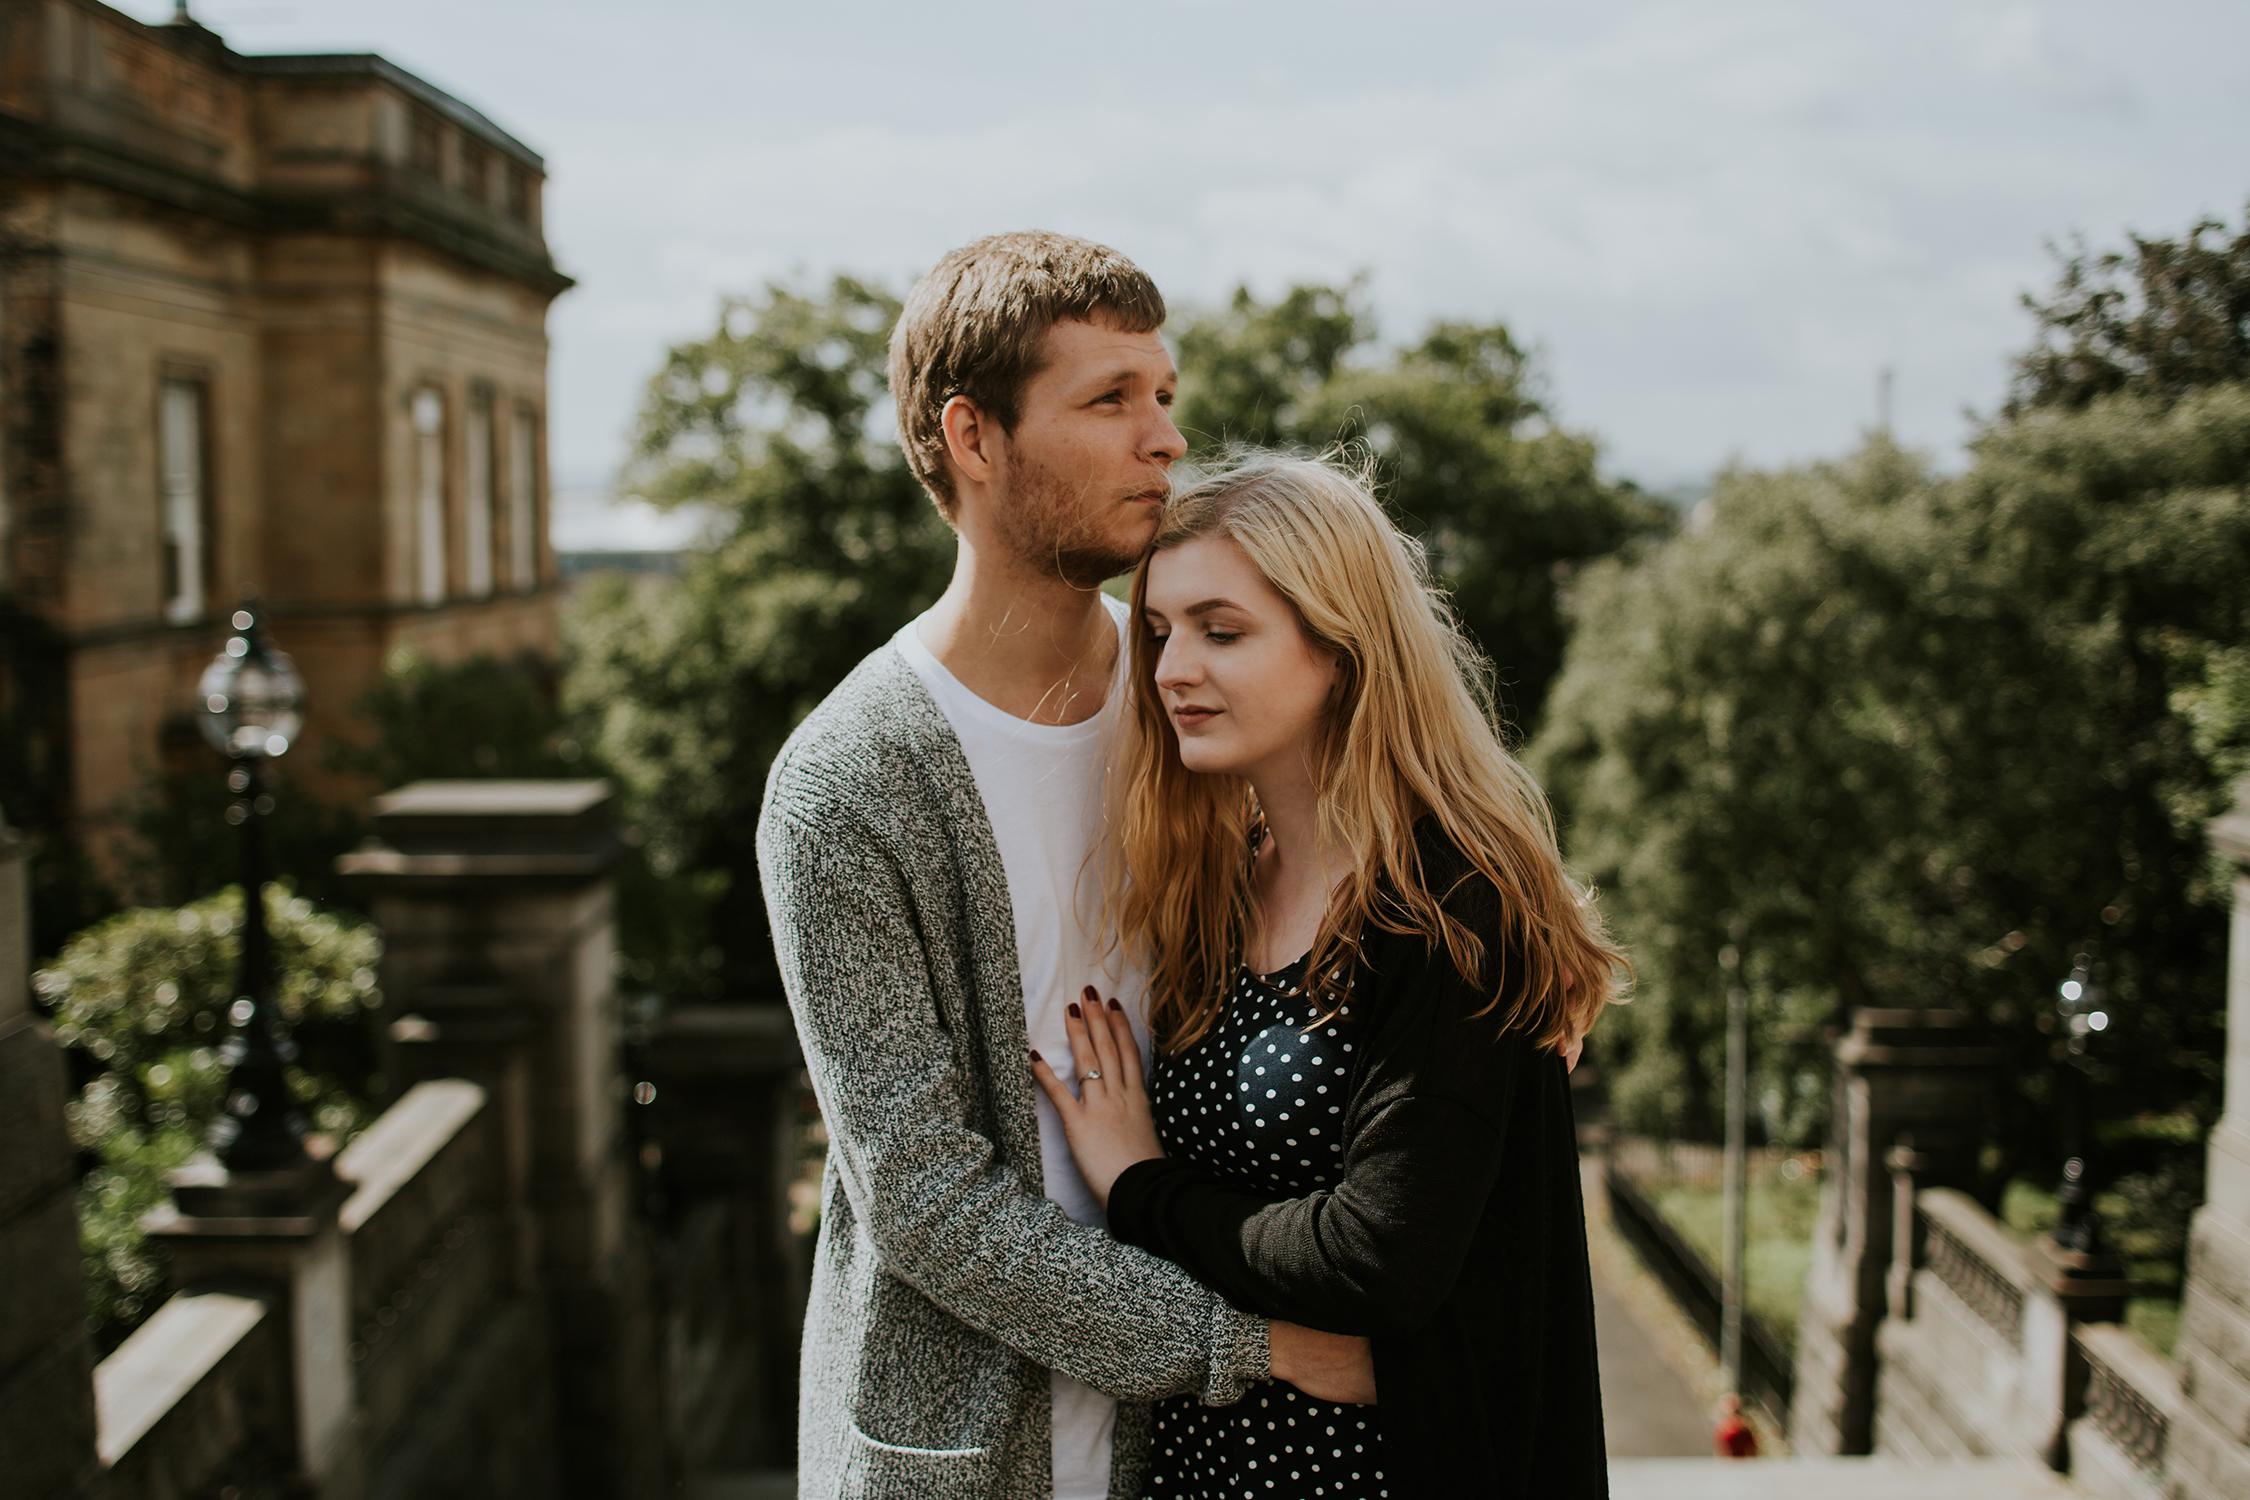 romantic_city_elopement_glasgow_edinburgh_wedding_photographer_32